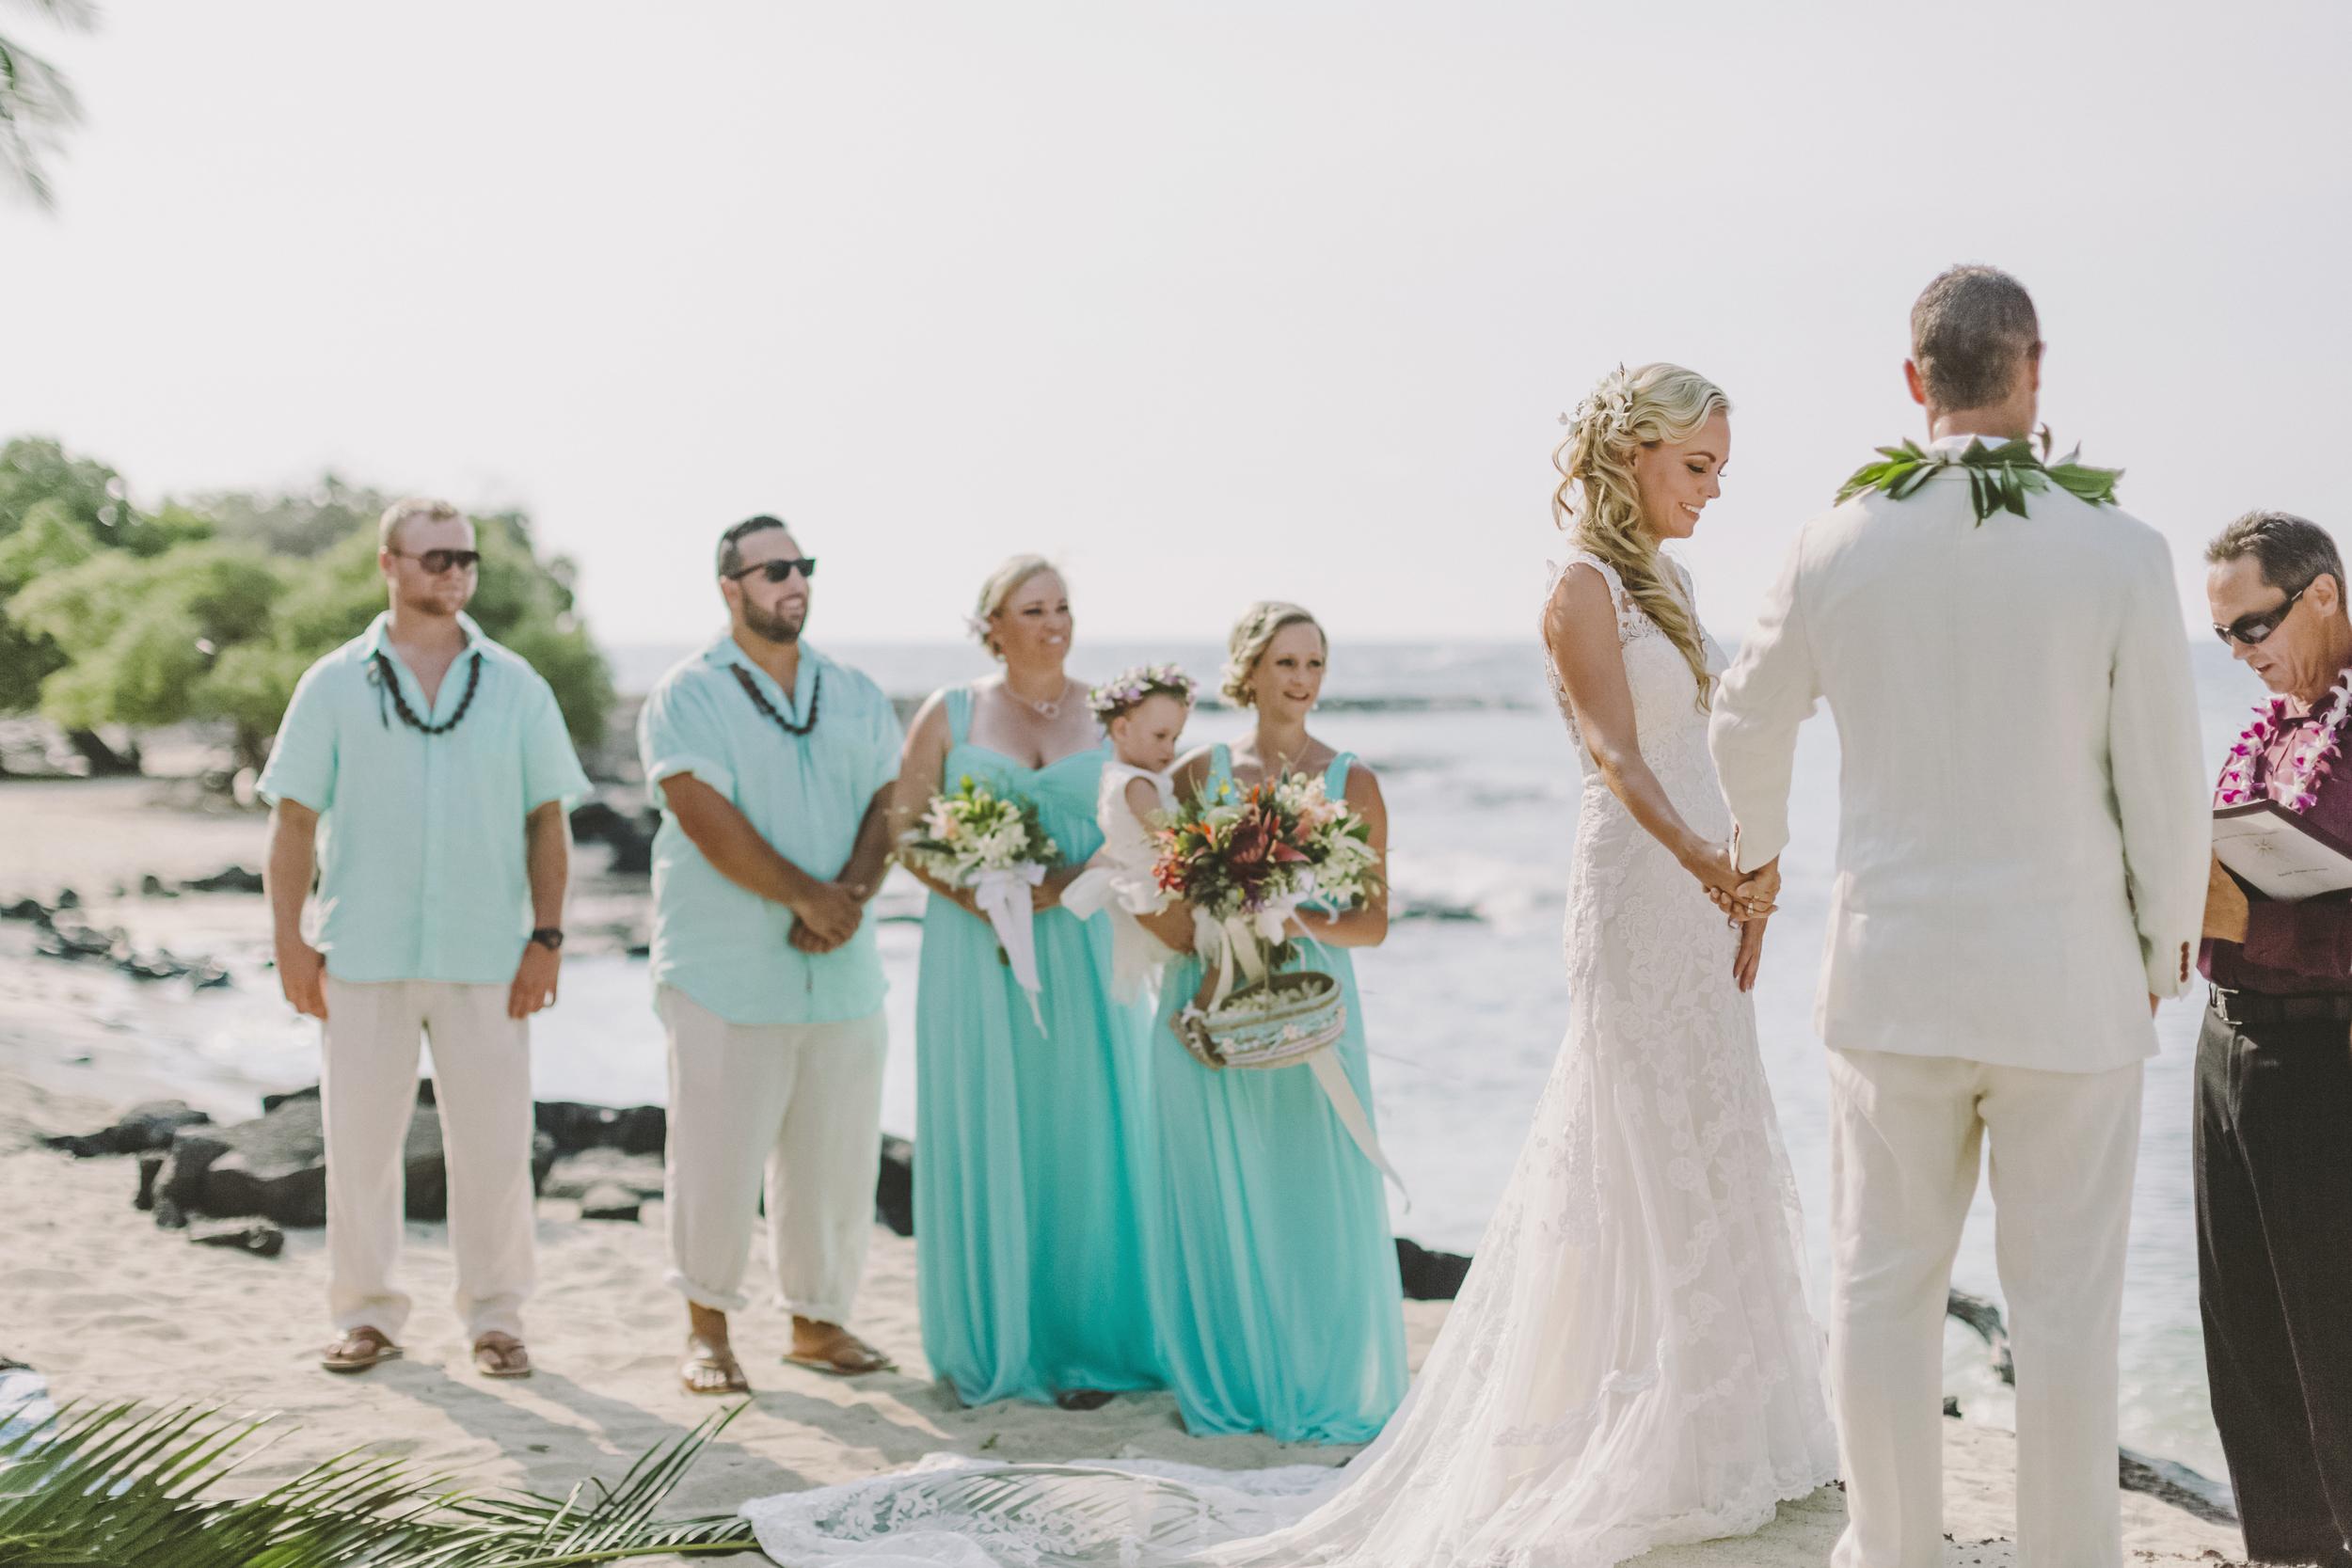 angie-diaz-photography-hawaii-wedding-photographer-kelli-jay-61.jpg